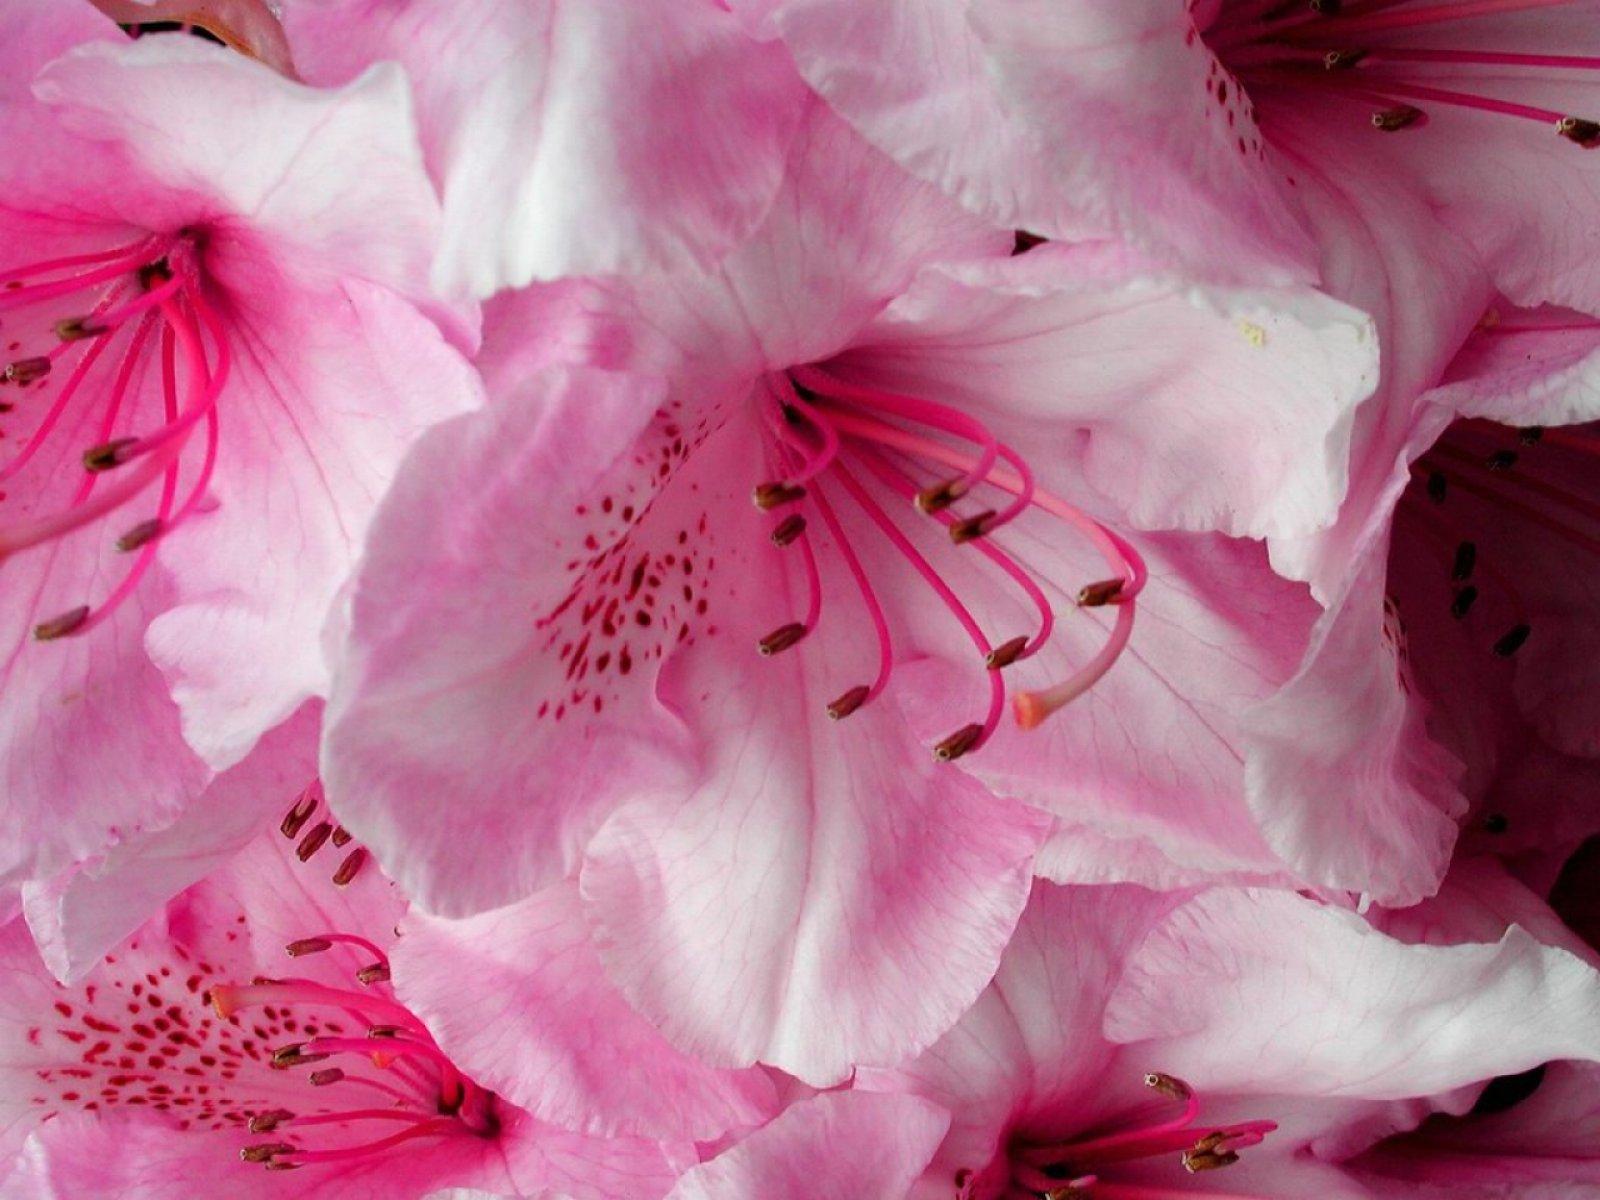 Beautiful pink flower petals Flowers and Nature computer desktop 1600x1200